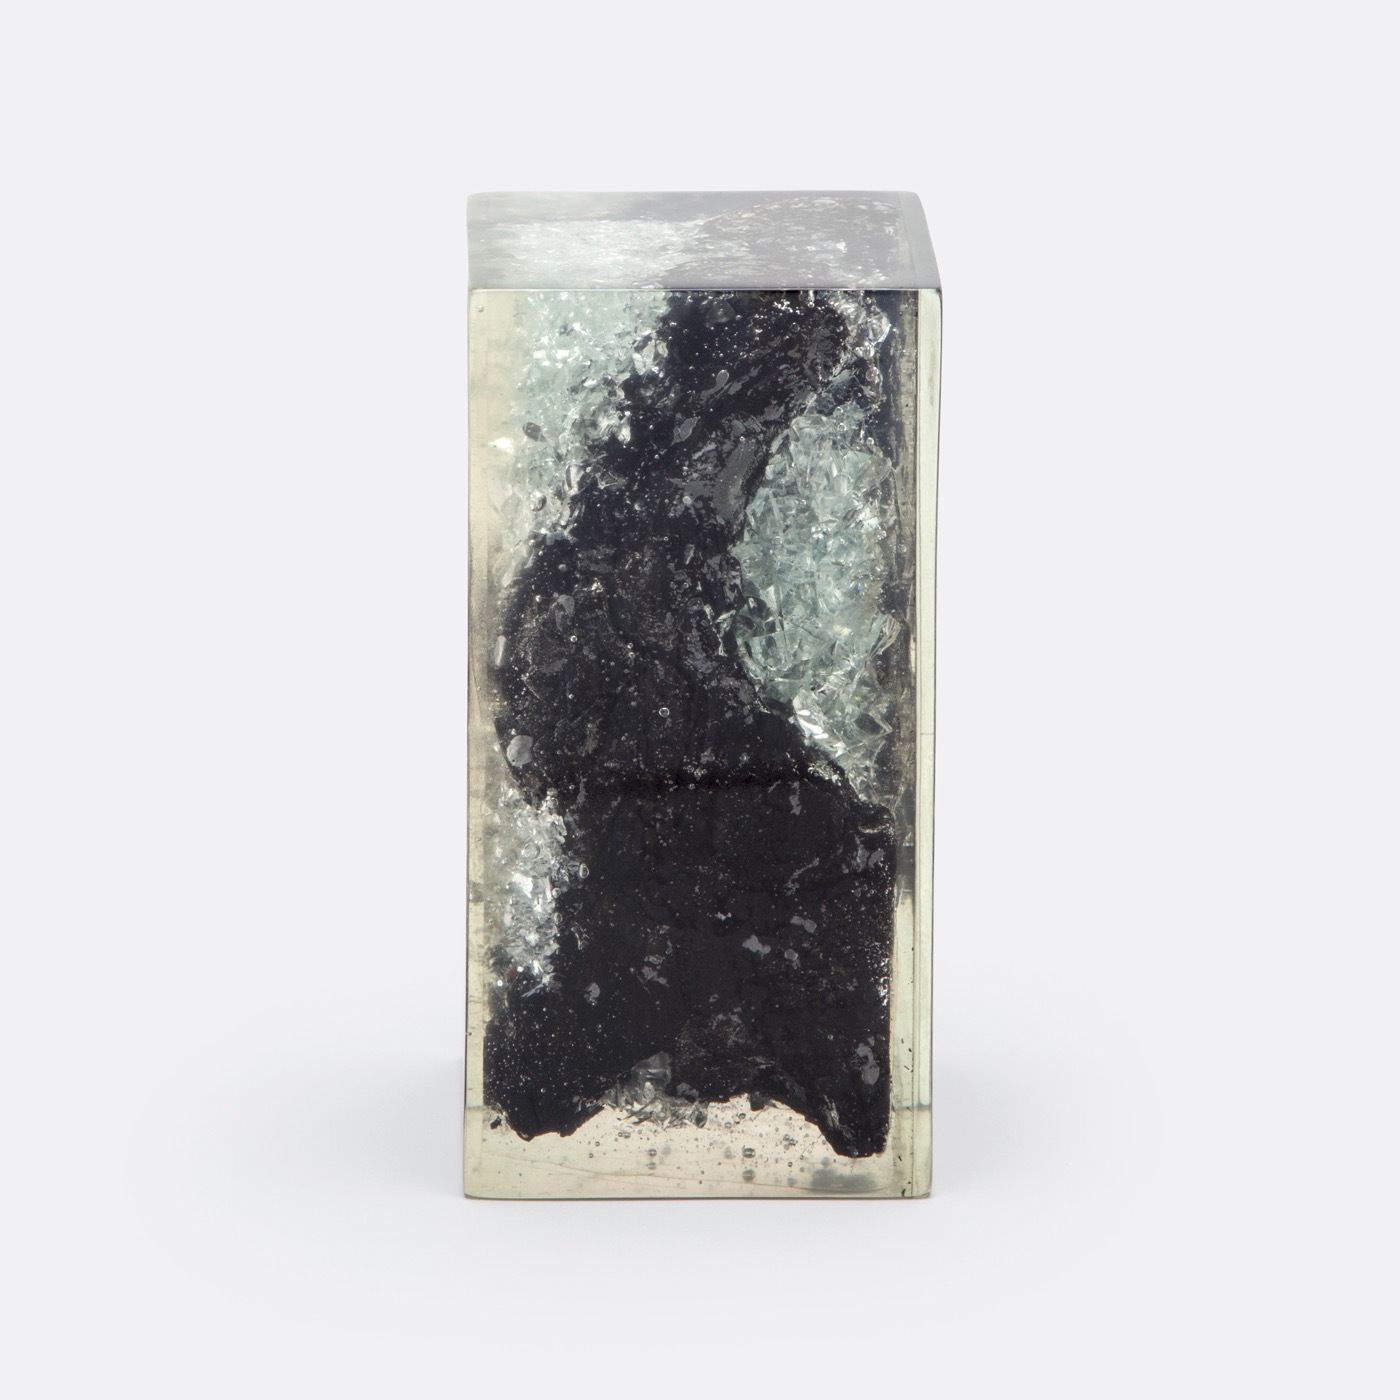 Hockett Objects Set | Black